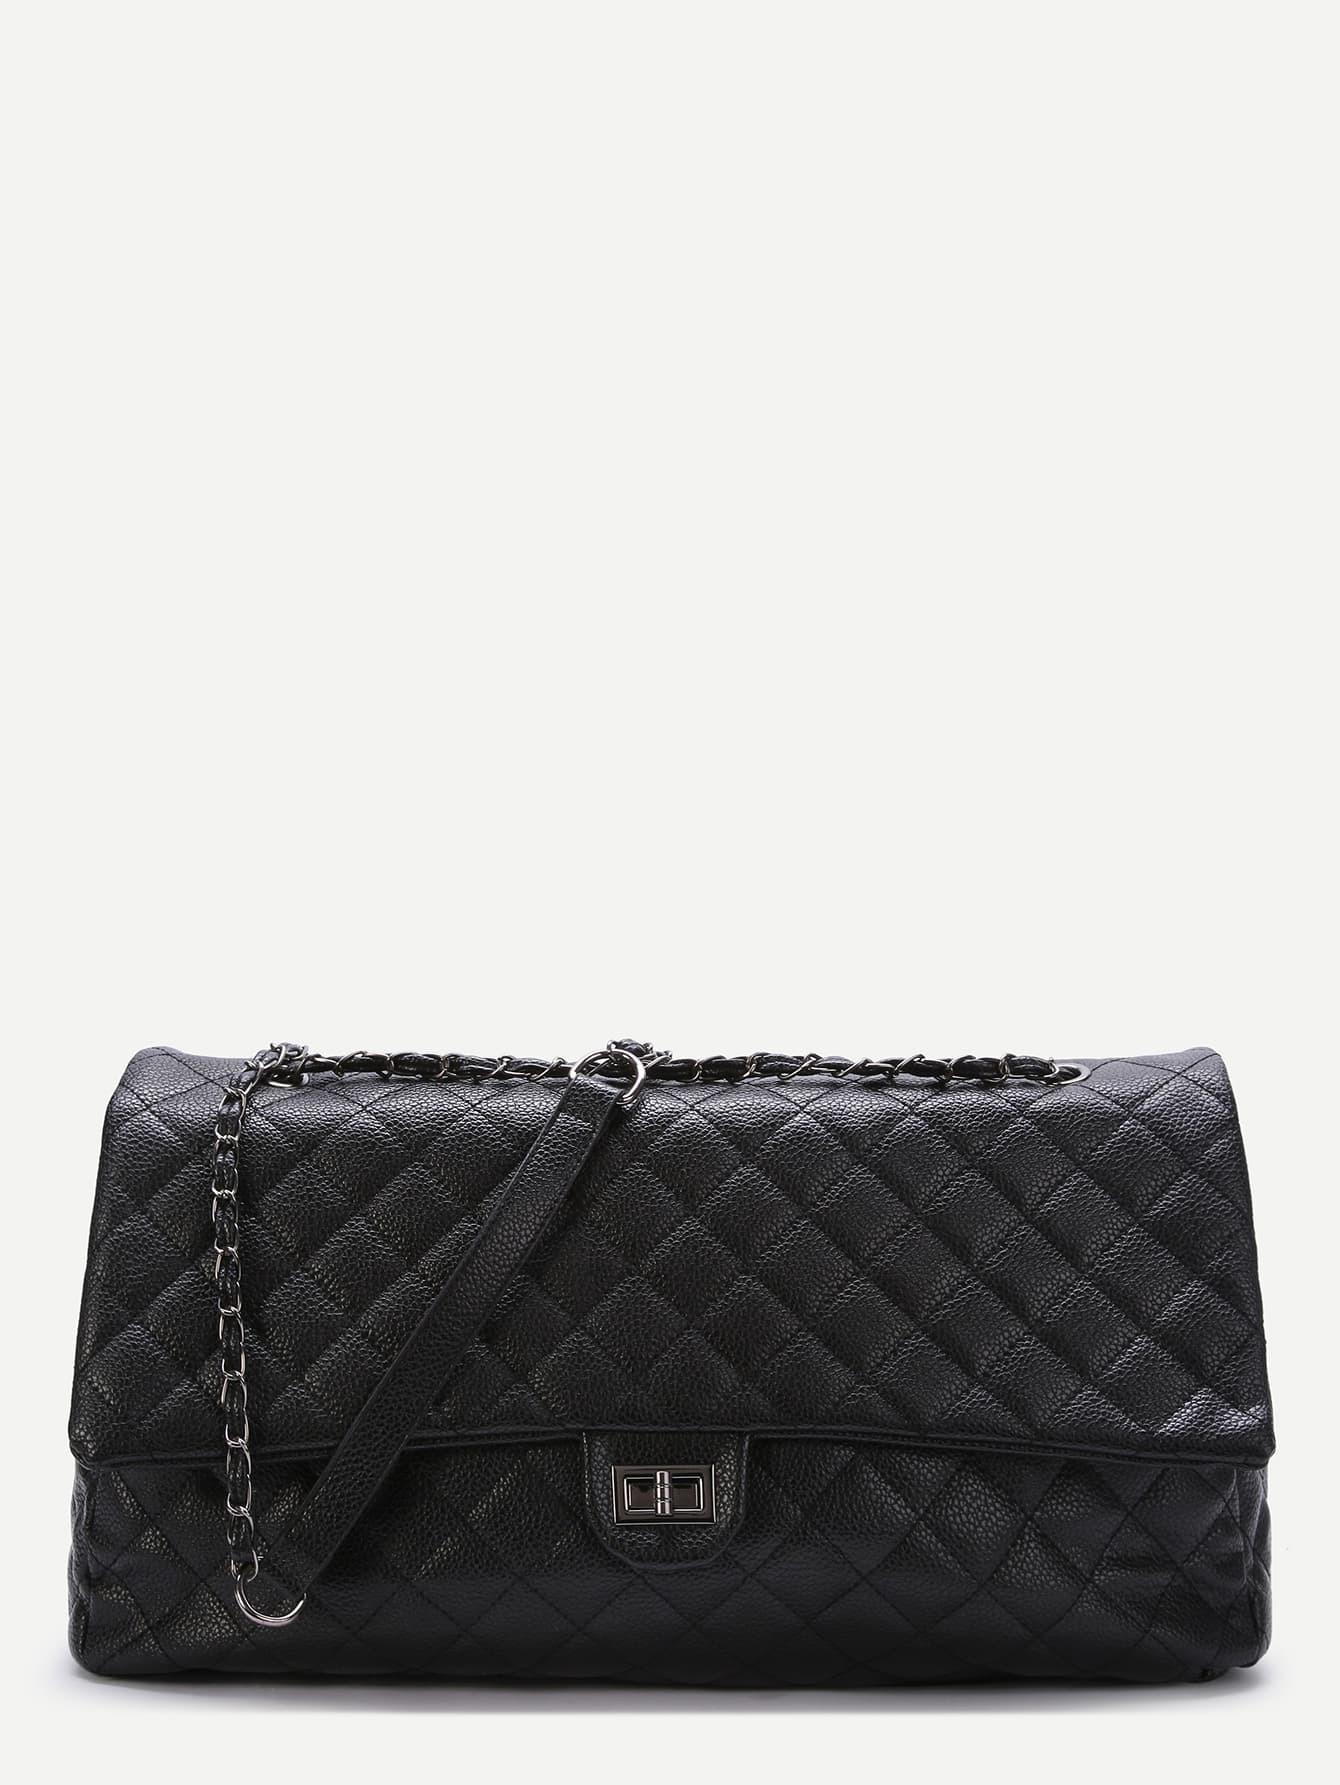 bag170308301_1